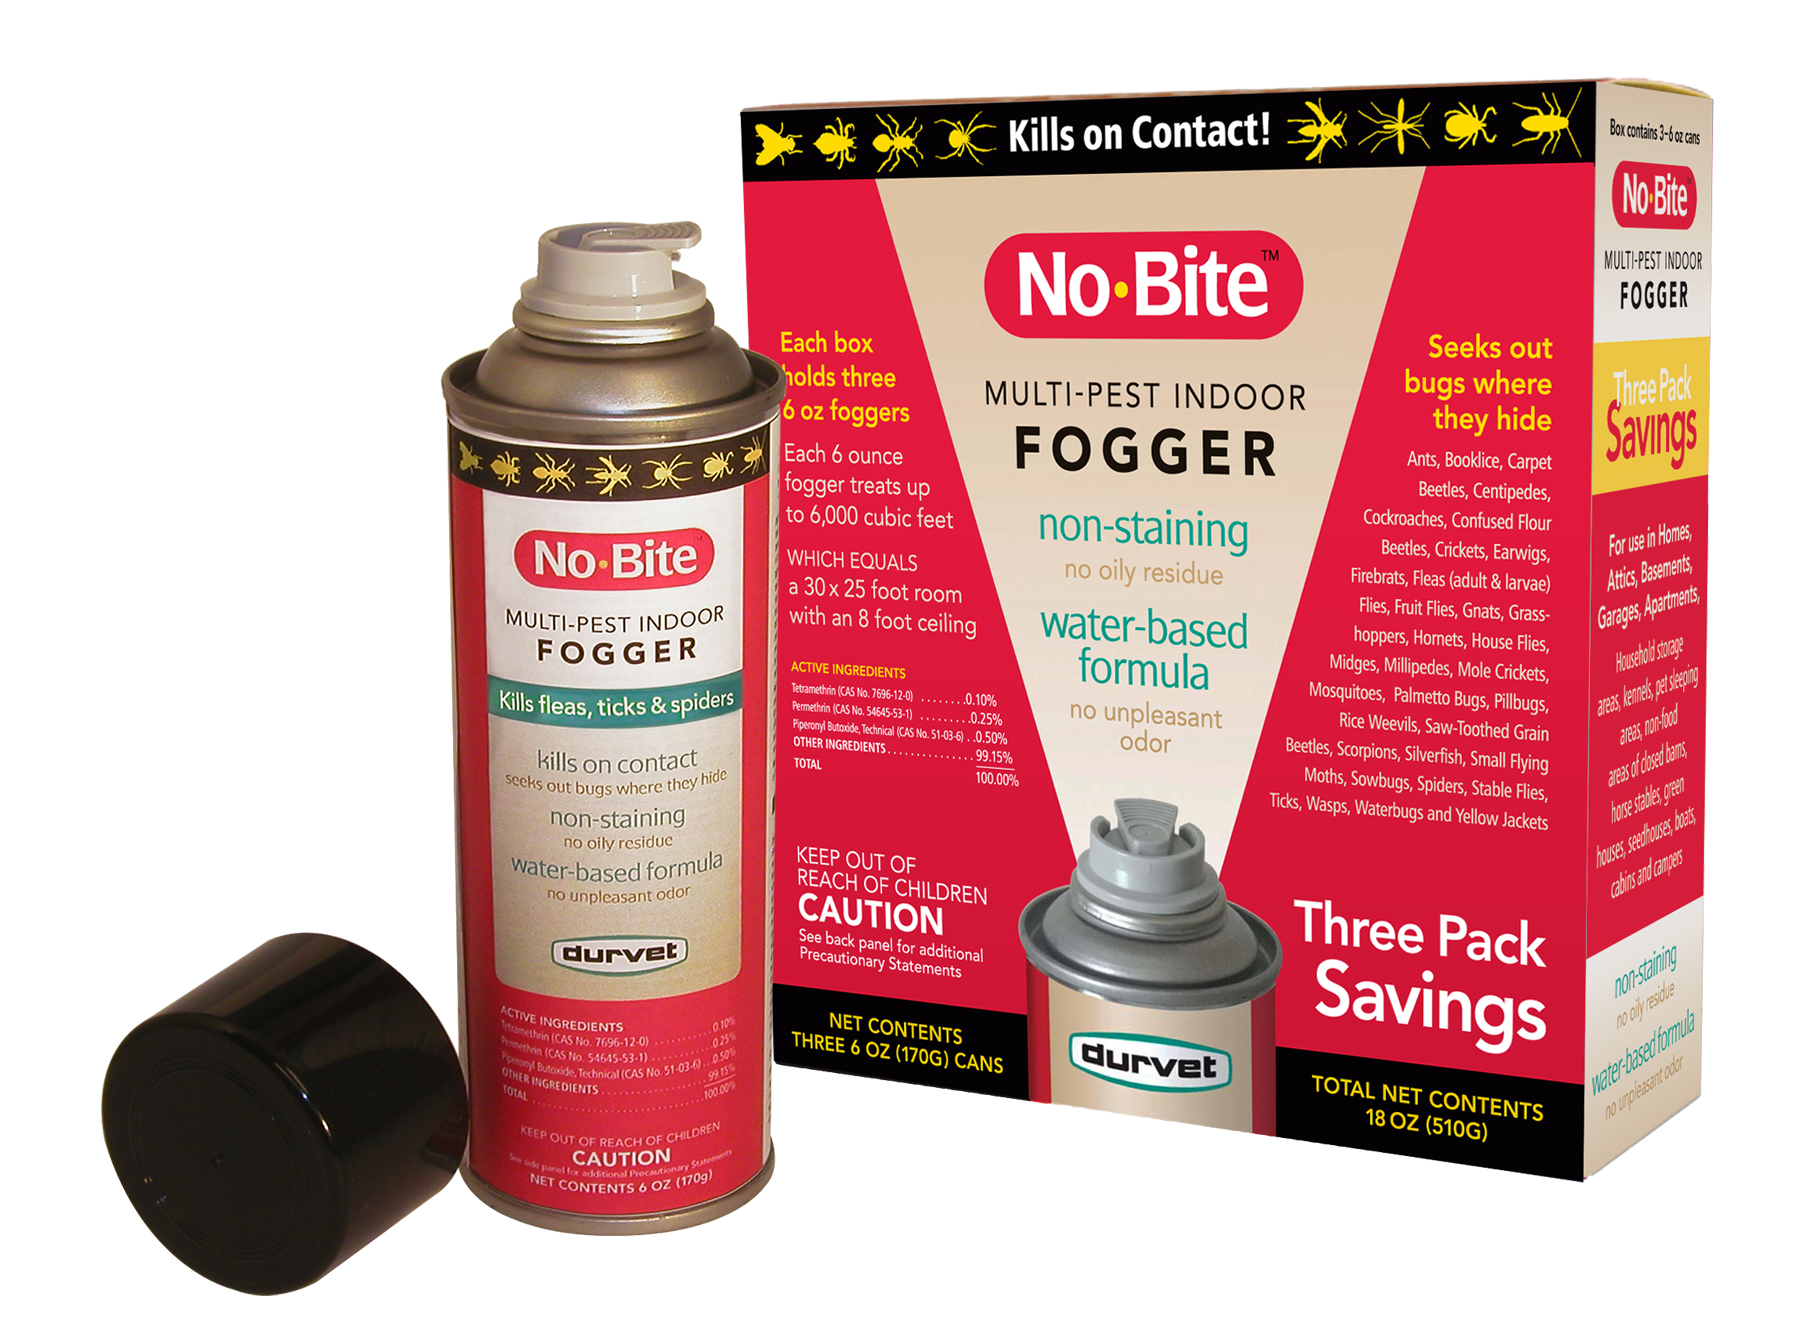 No-Bite Multi-Pest Fogger